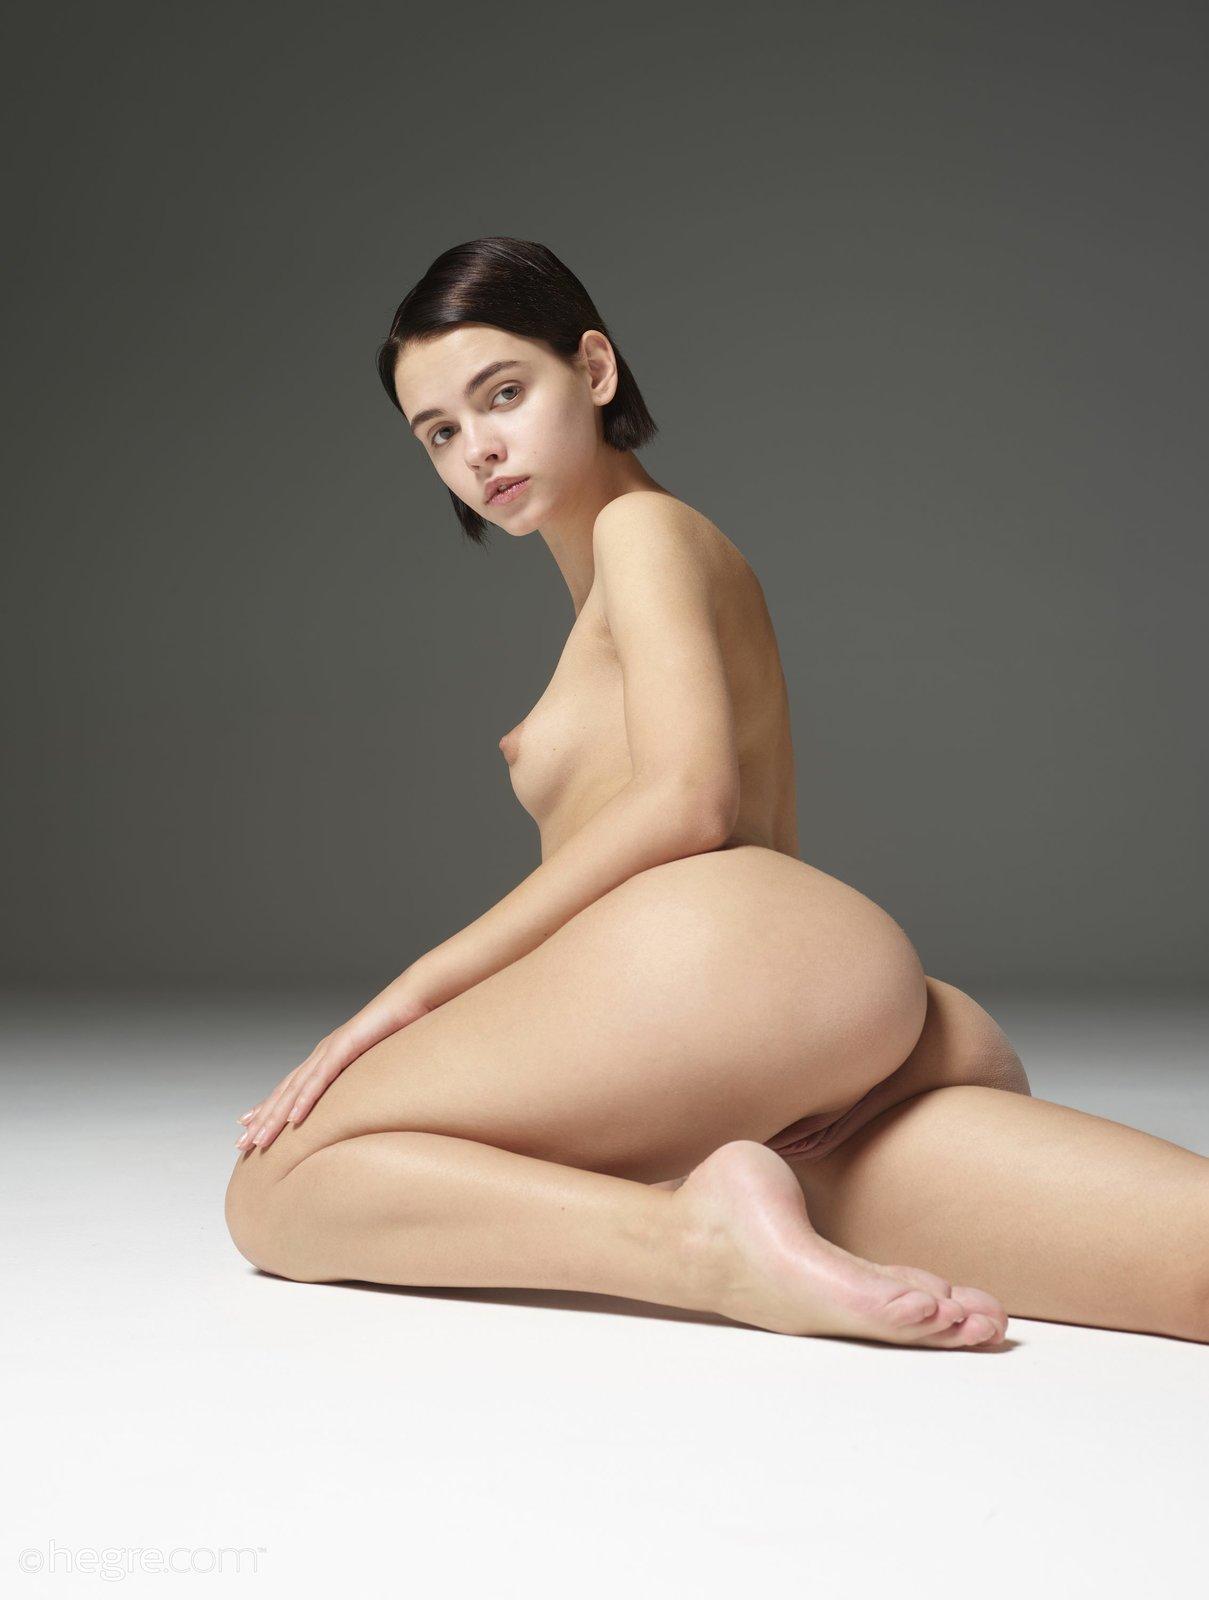 Ariel In Angel Nudes By Hegre-Art 12 Photos  Erotic